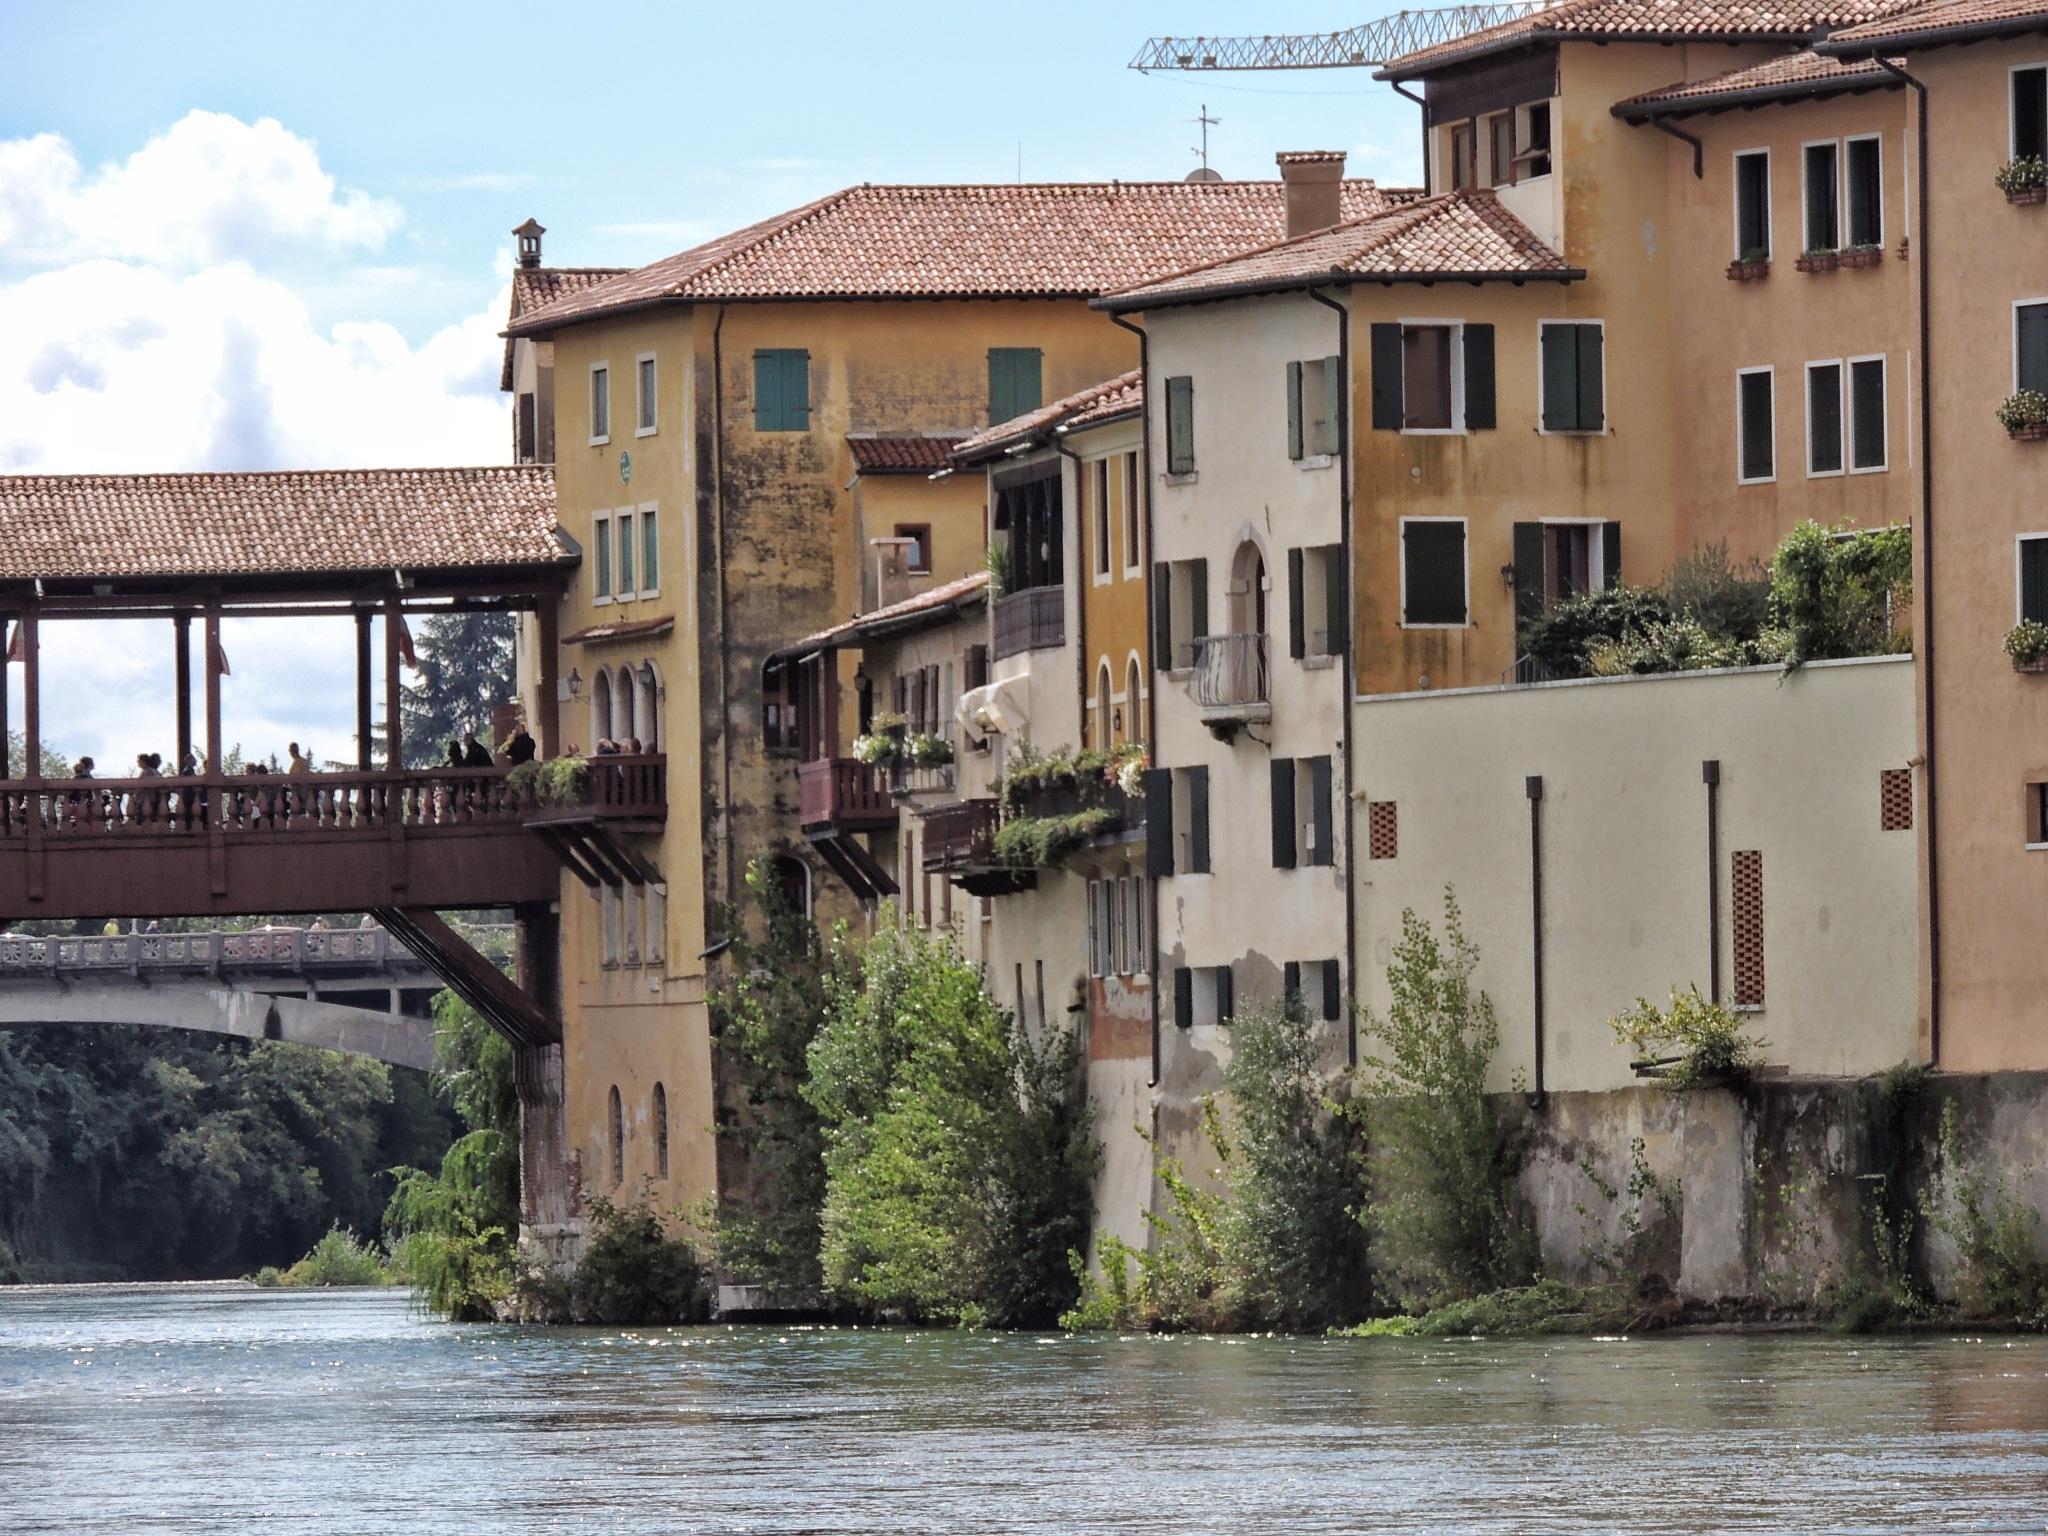 Wood Bridge by Damiano Mozzato